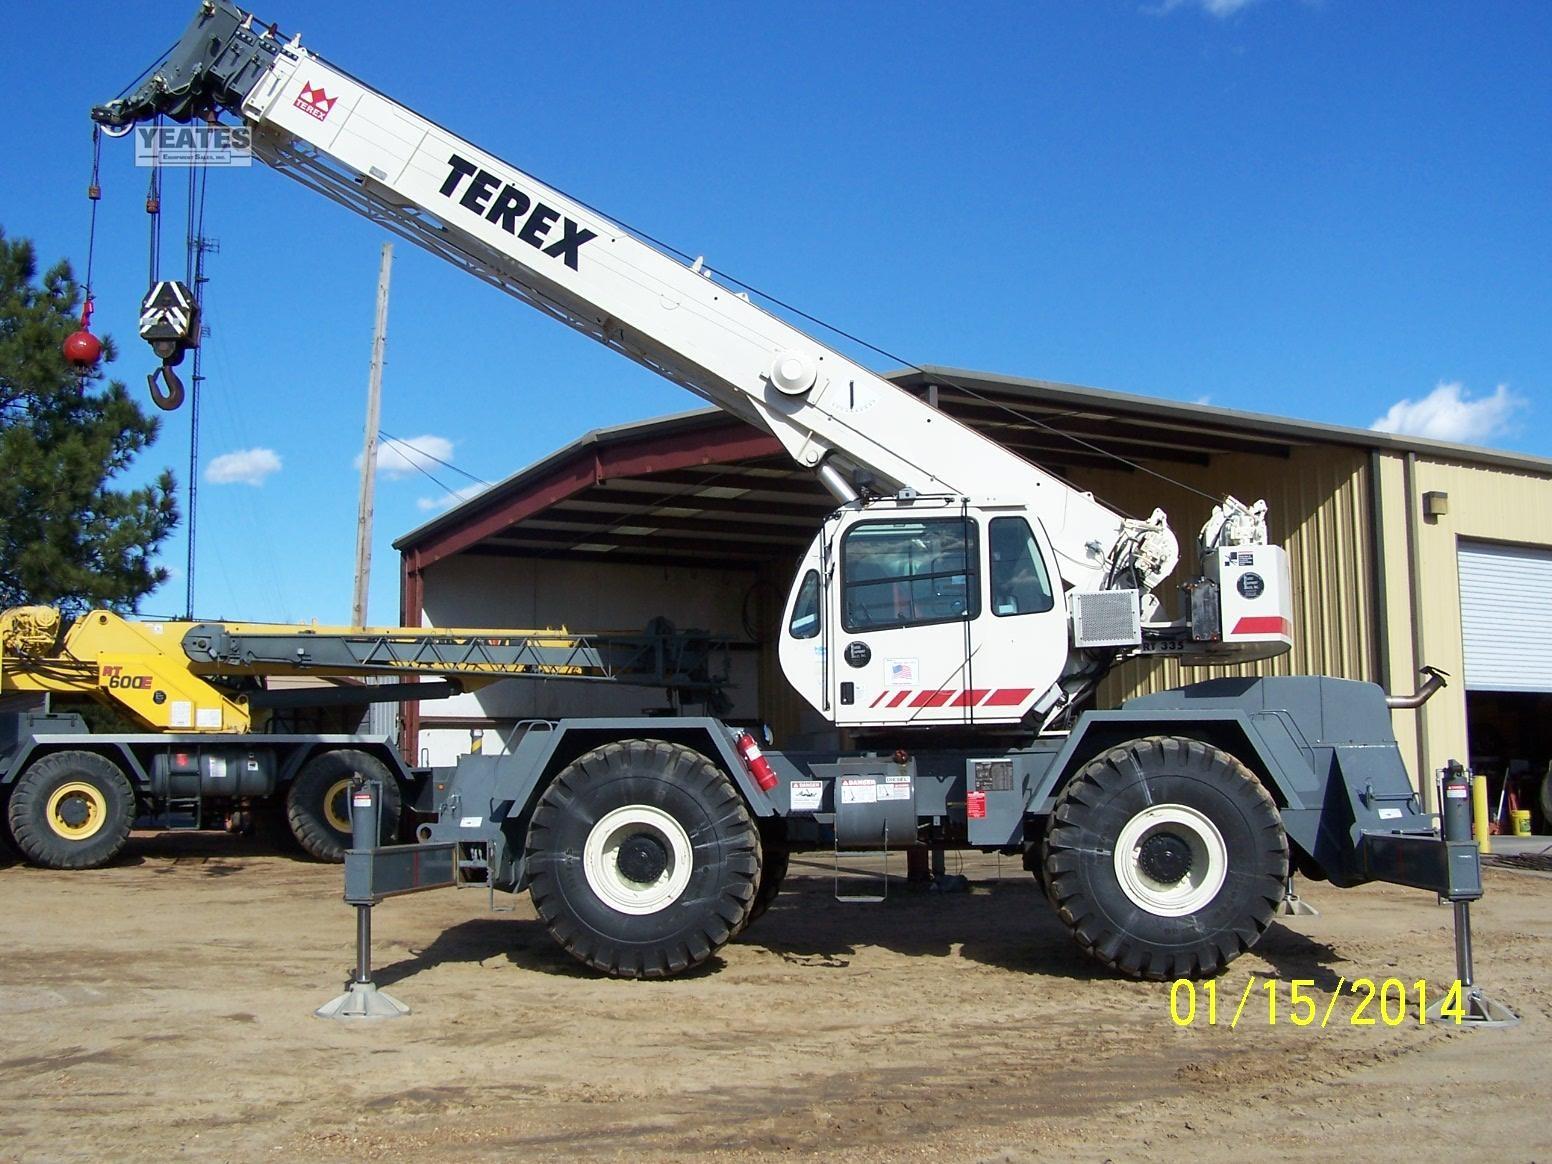 2005 TEREX RT335 For Sale in Byram, Mississippi